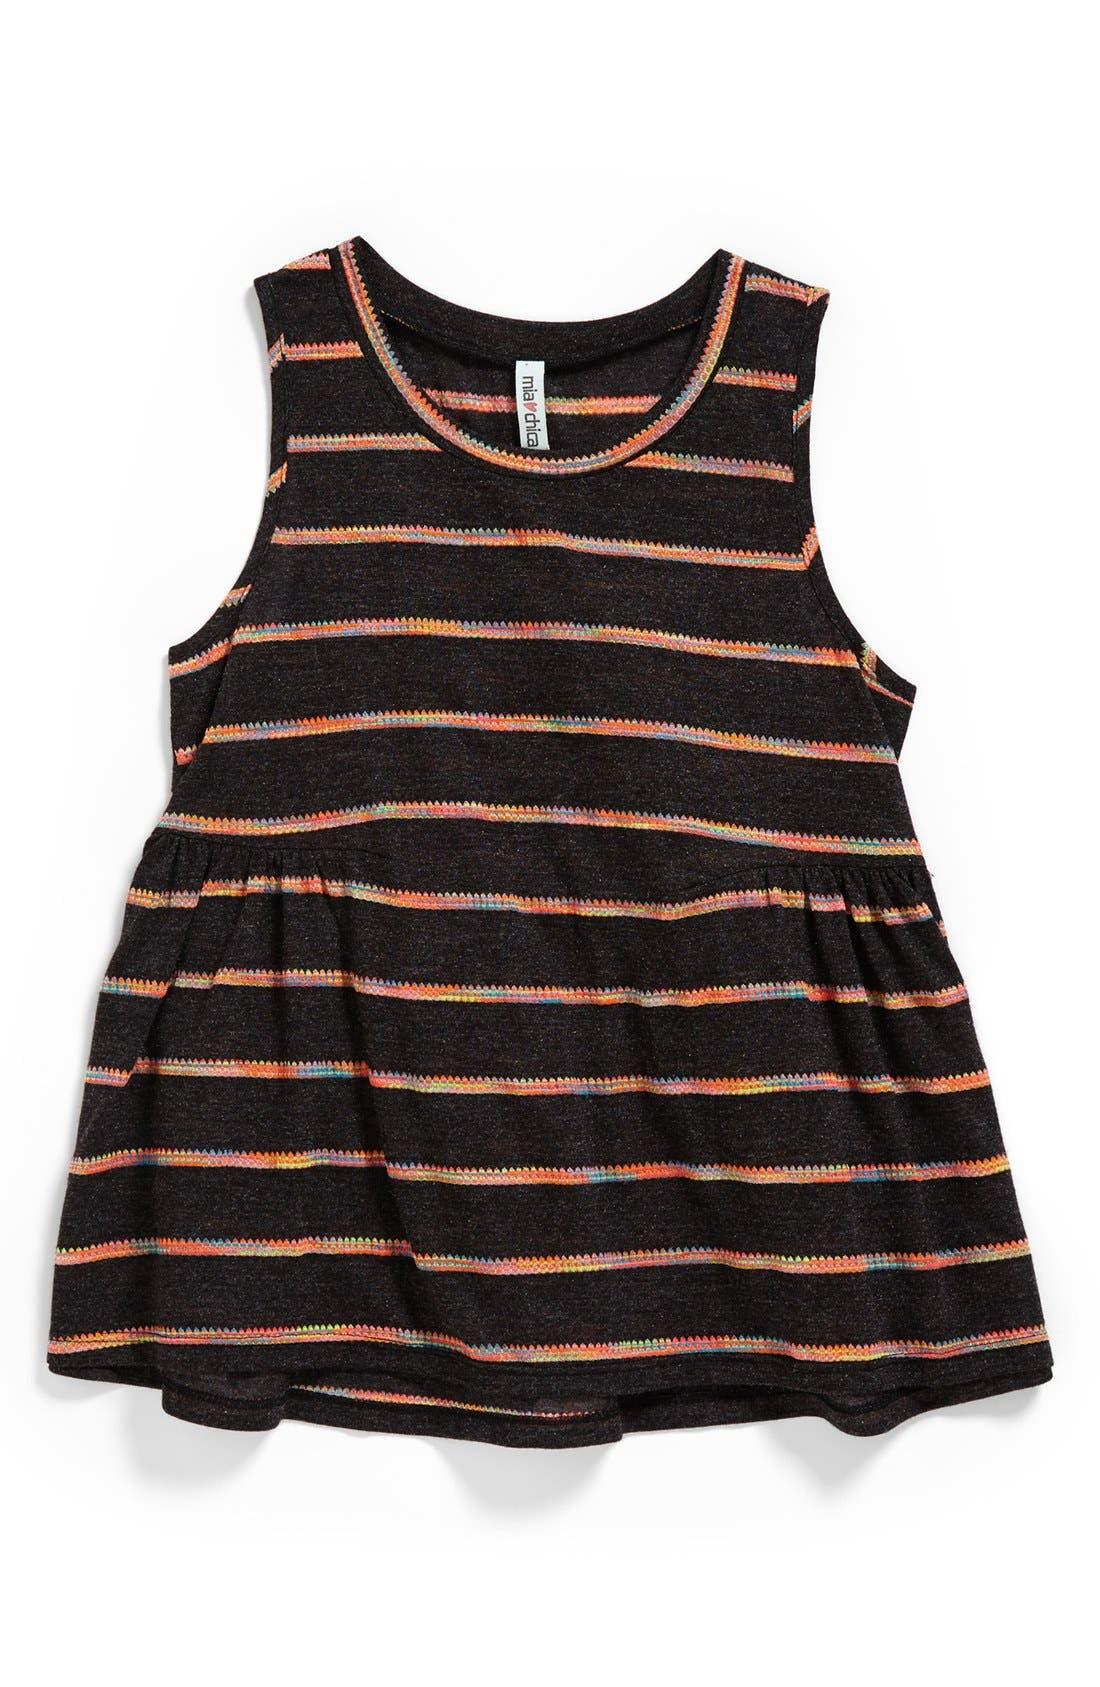 Alternate Image 1 Selected - Mia Chica Space Dye Stripe Top (Little Girls & Big Girls)